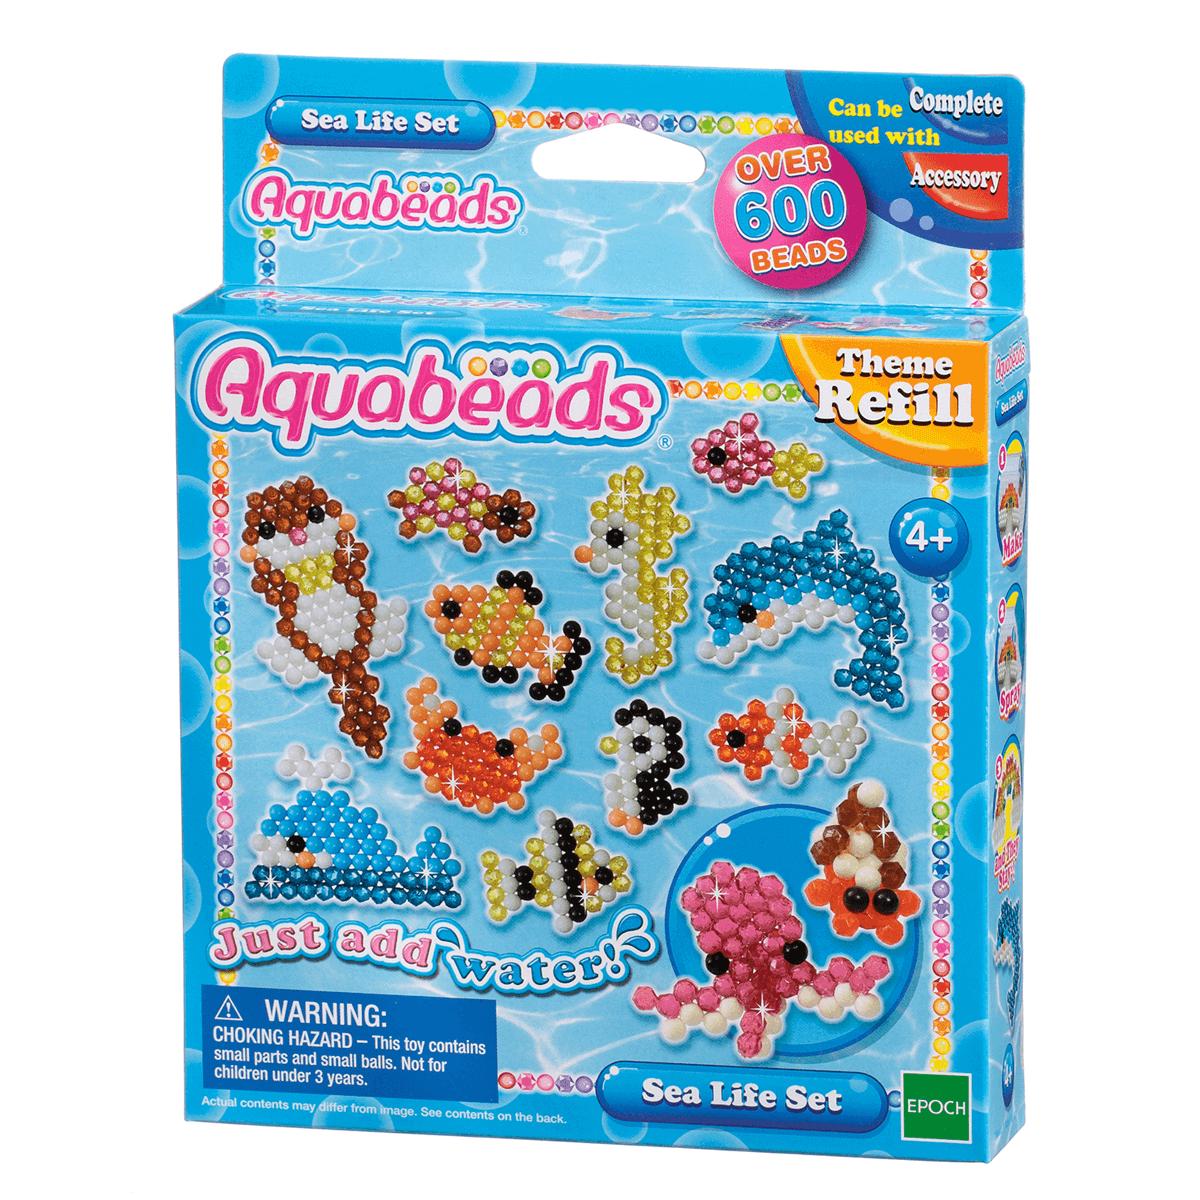 Aquabeads Sea Life Set Kids Fun Party Toy NEW